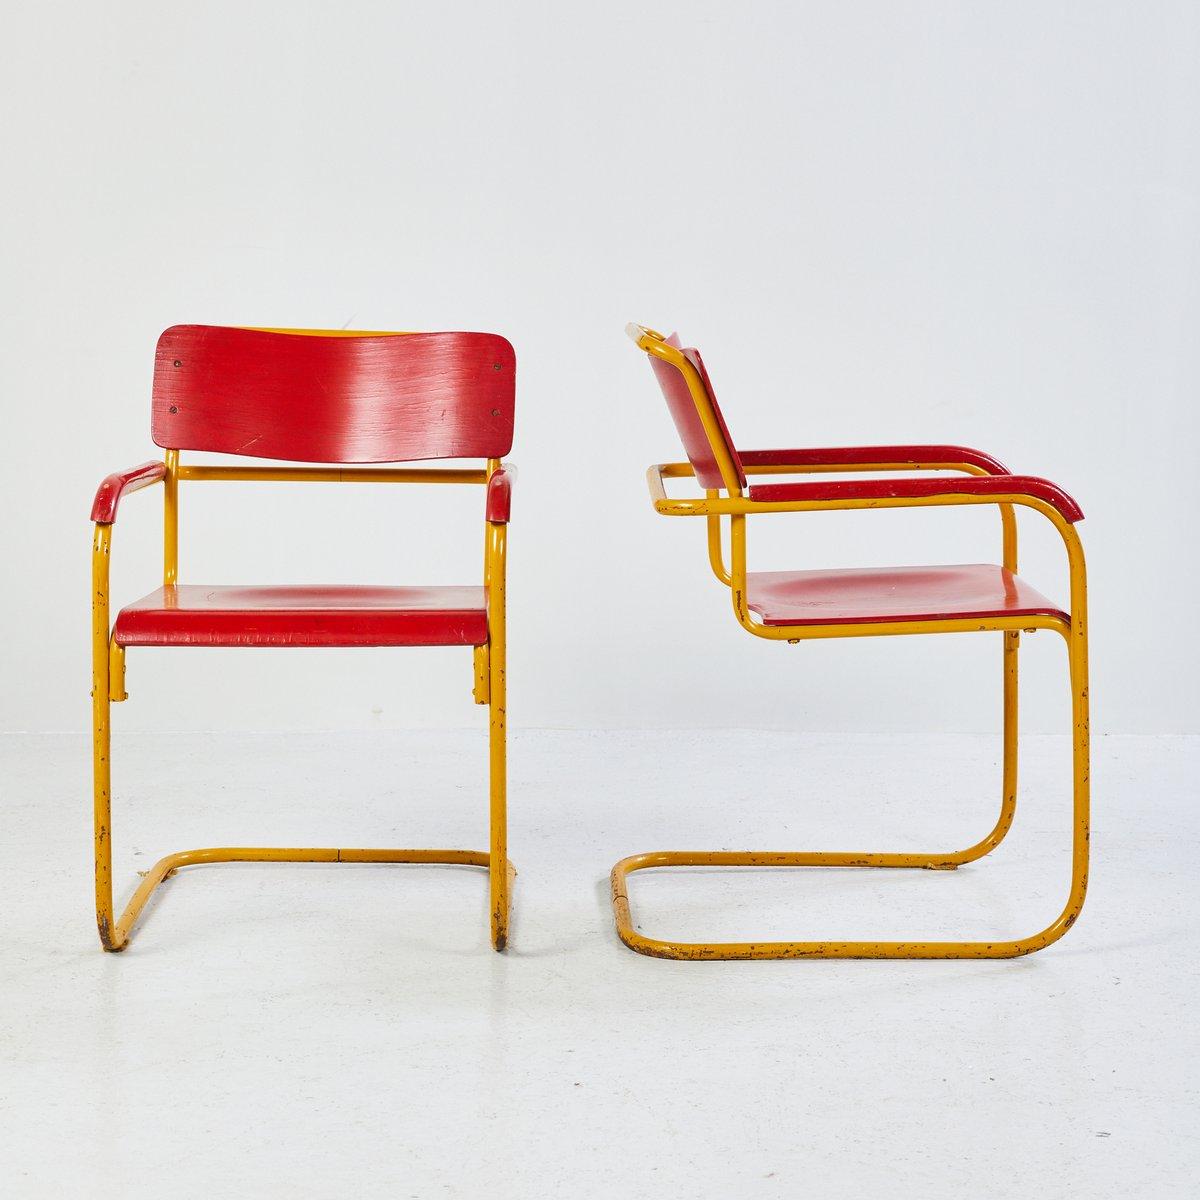 stuhl im bauhaus stil in rot blau 1960er bei pamono kaufen. Black Bedroom Furniture Sets. Home Design Ideas